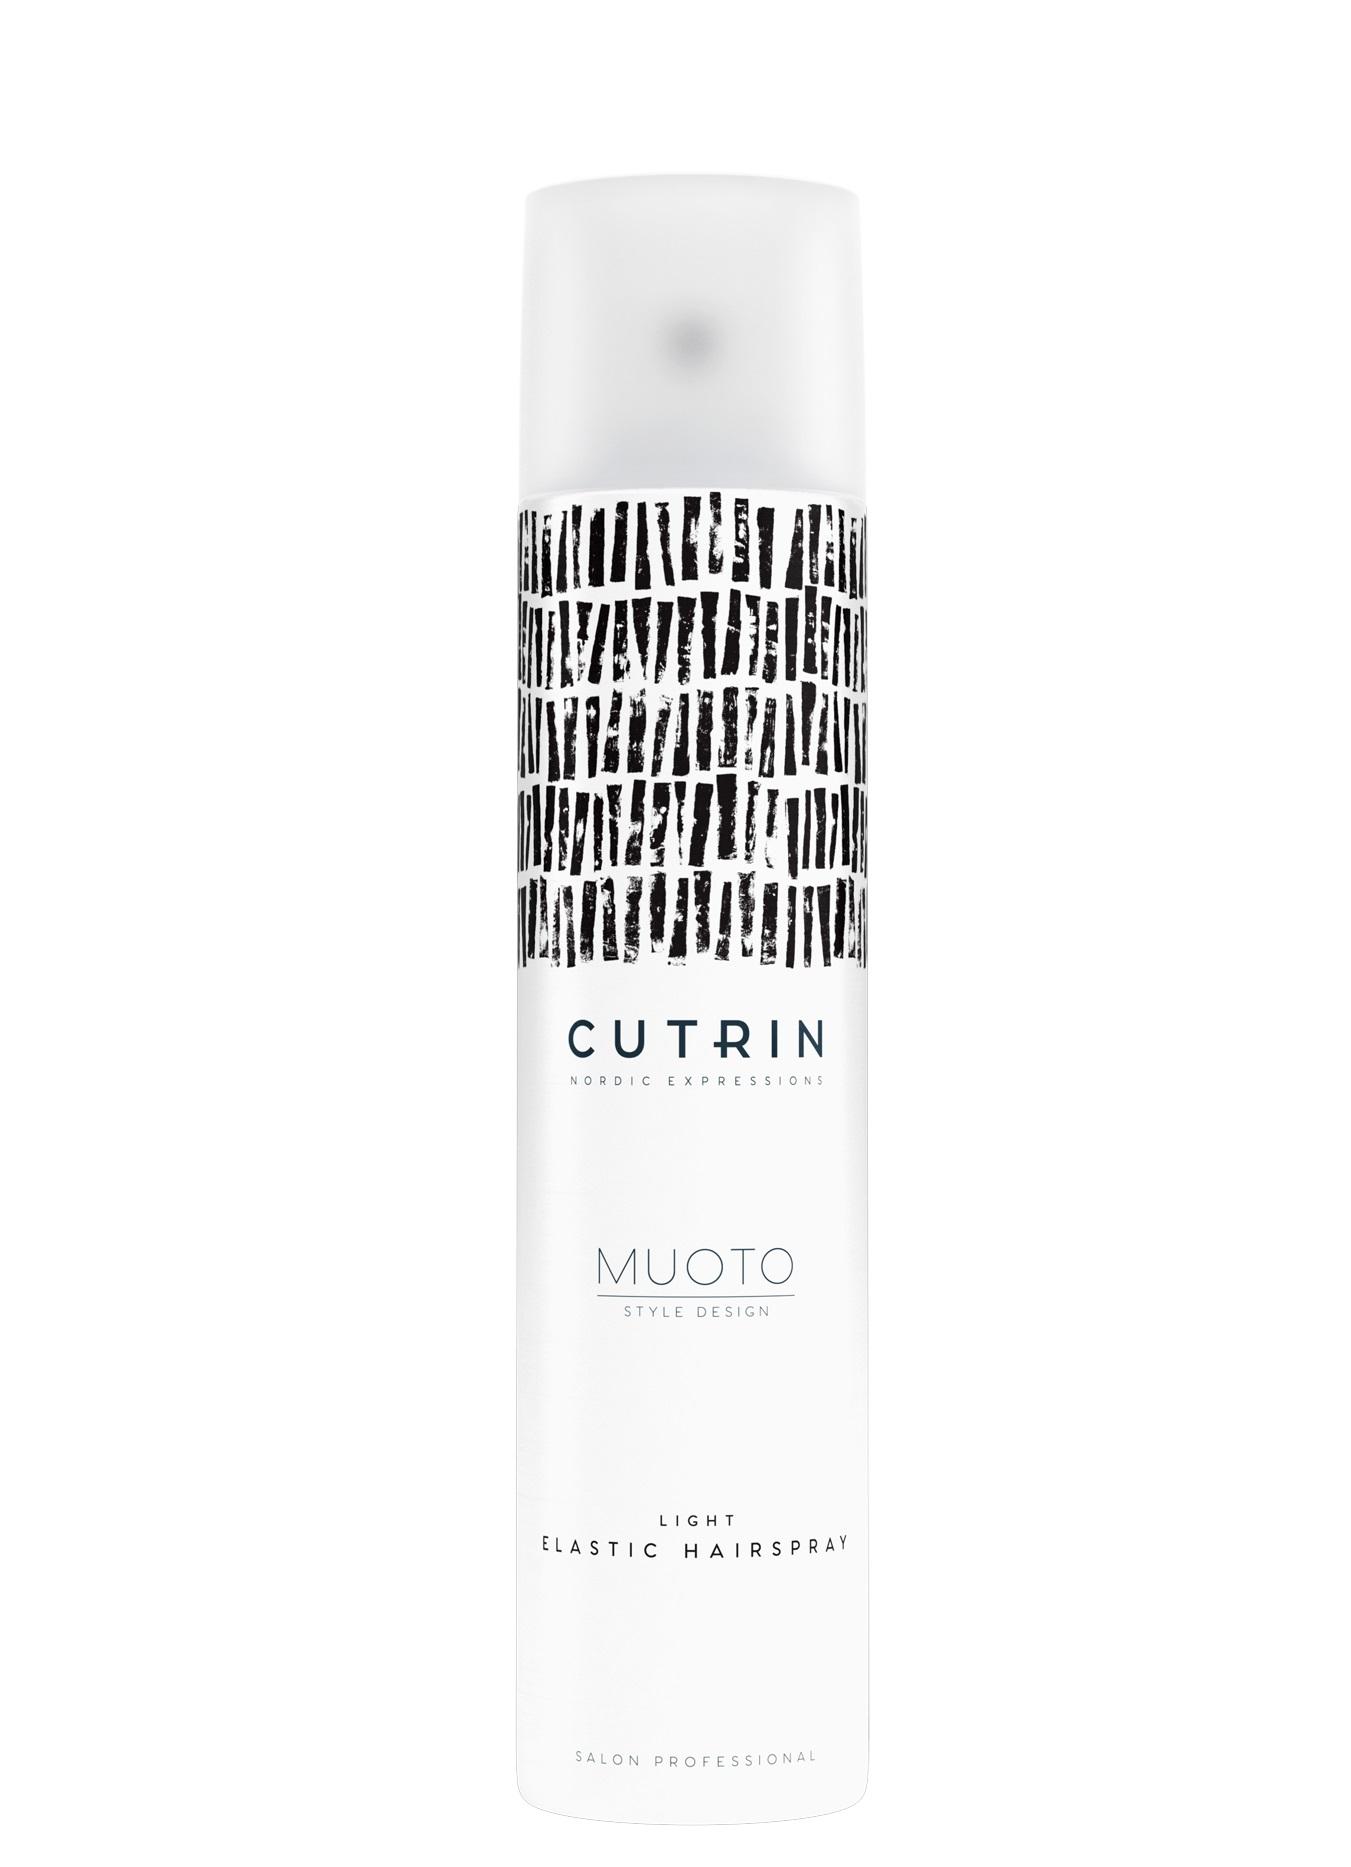 CUTRIN Лак легкой эластичной фиксации / MUOTO LIGHT ELASTIC HAIRSPRAY 300 мл.